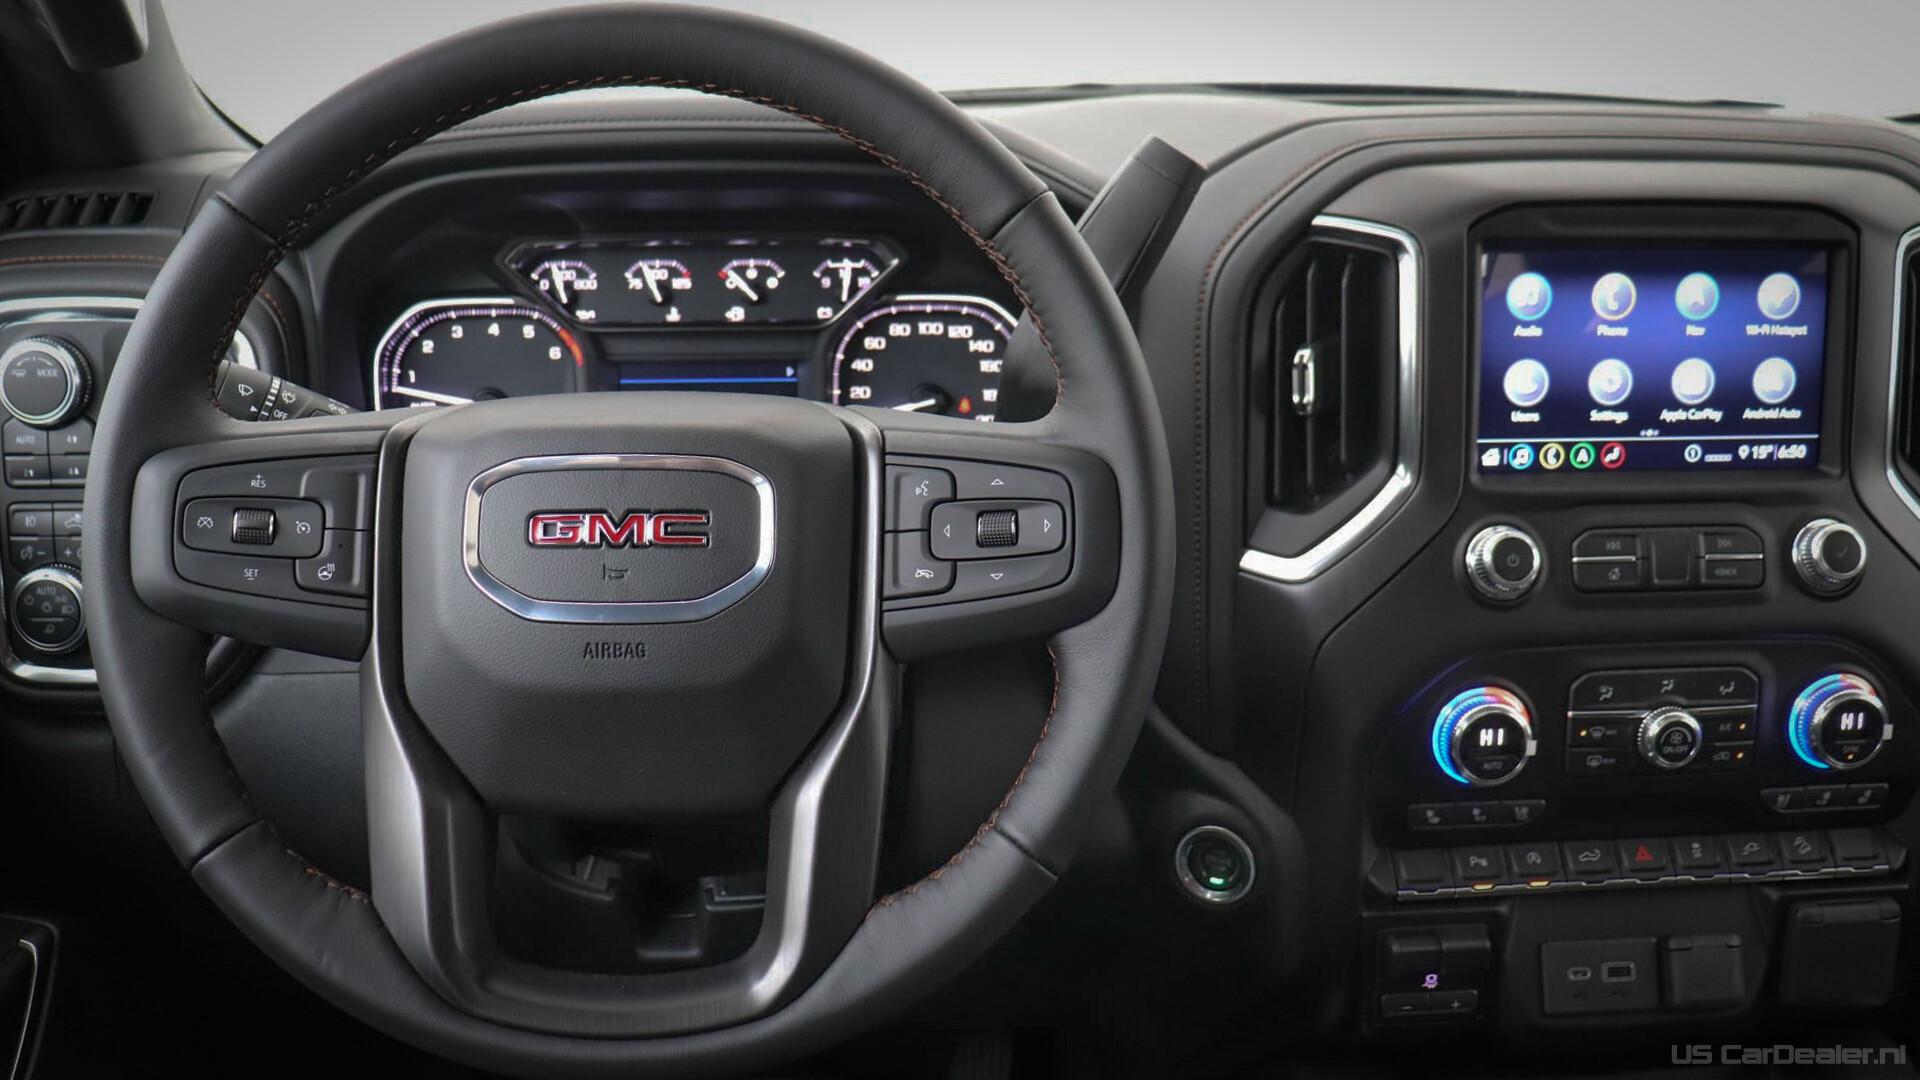 Luxus-Cockpit